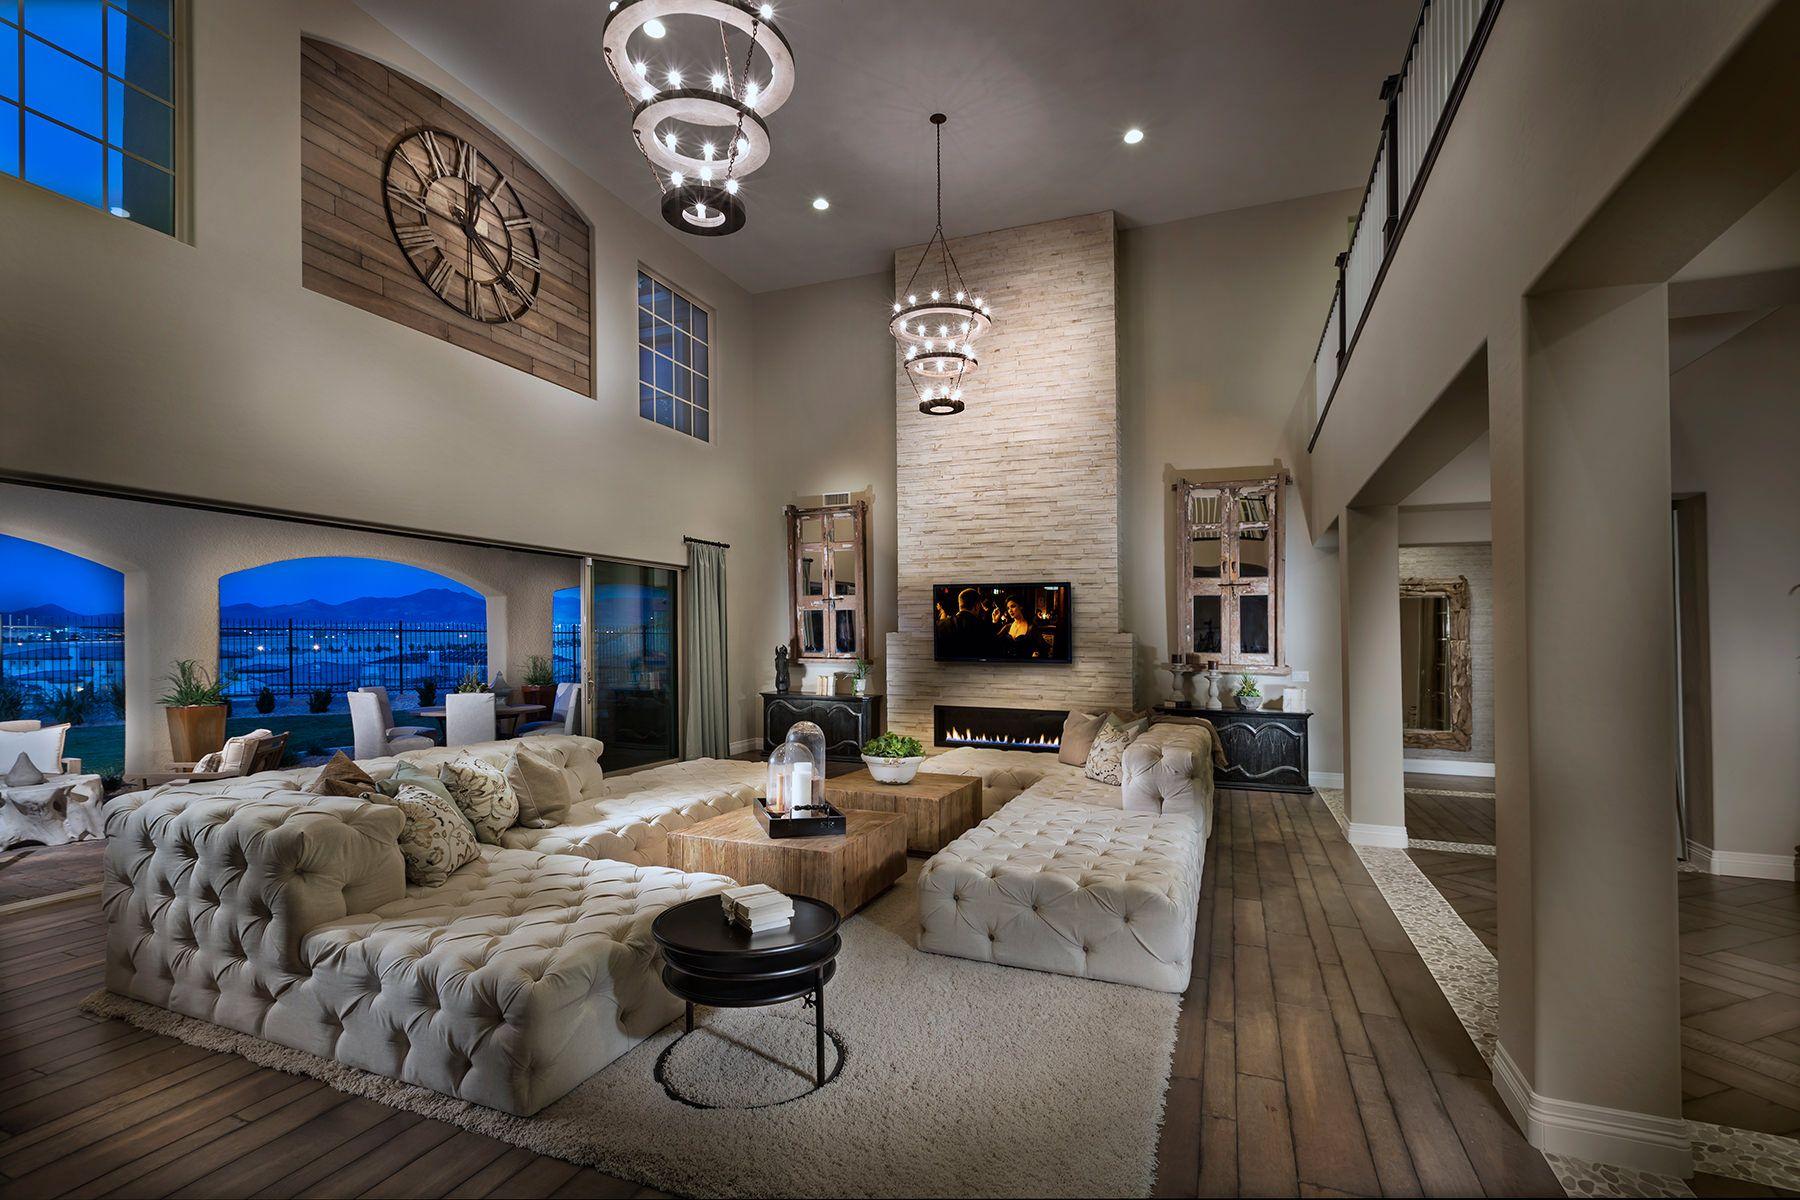 Ambrosia interior design home design - Lennar homes interior paint colors ...